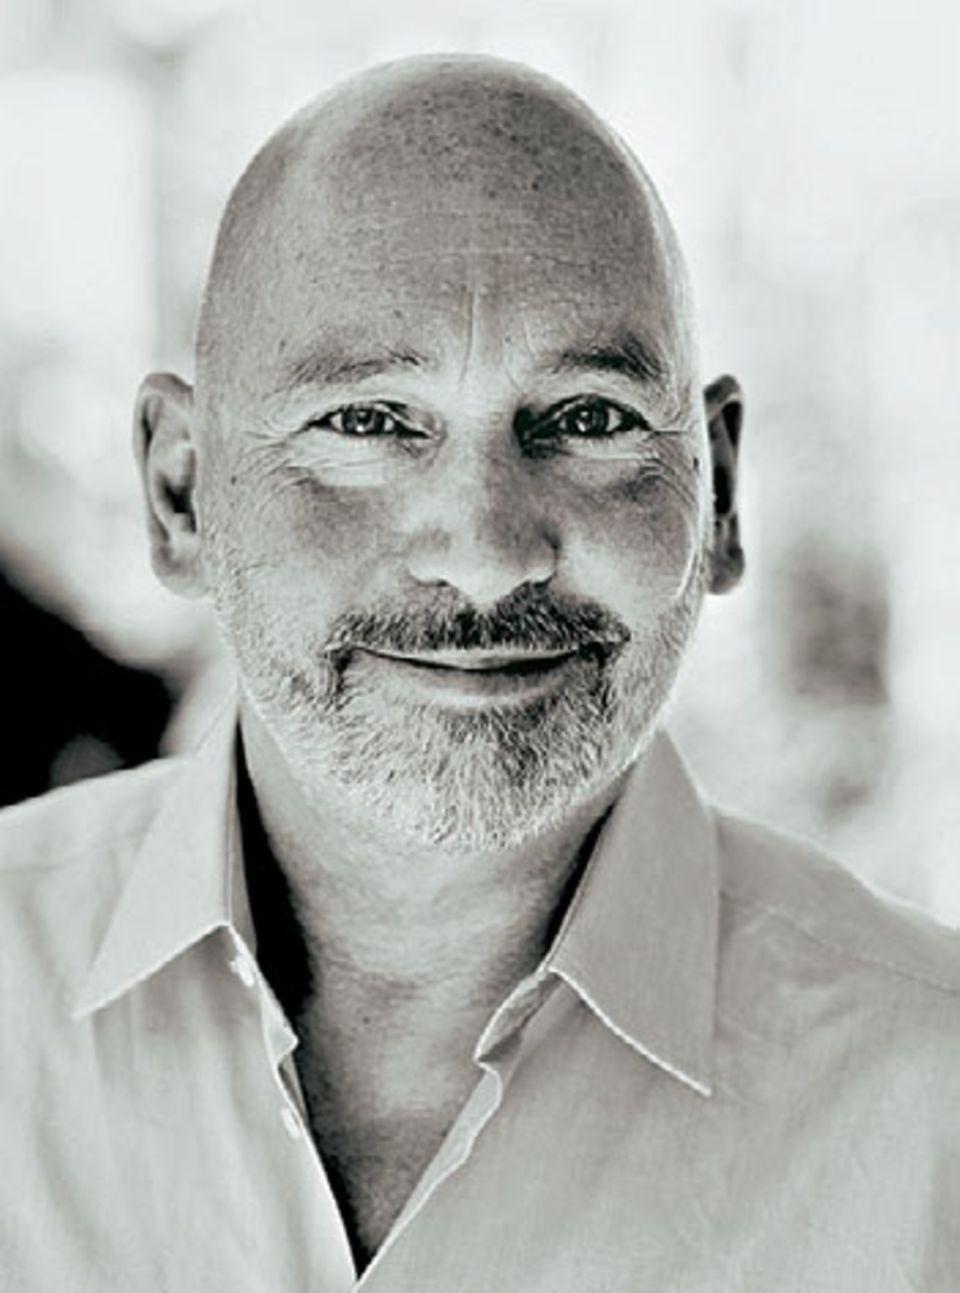 Neu in den Partner verlieben: Oskar Holzberg